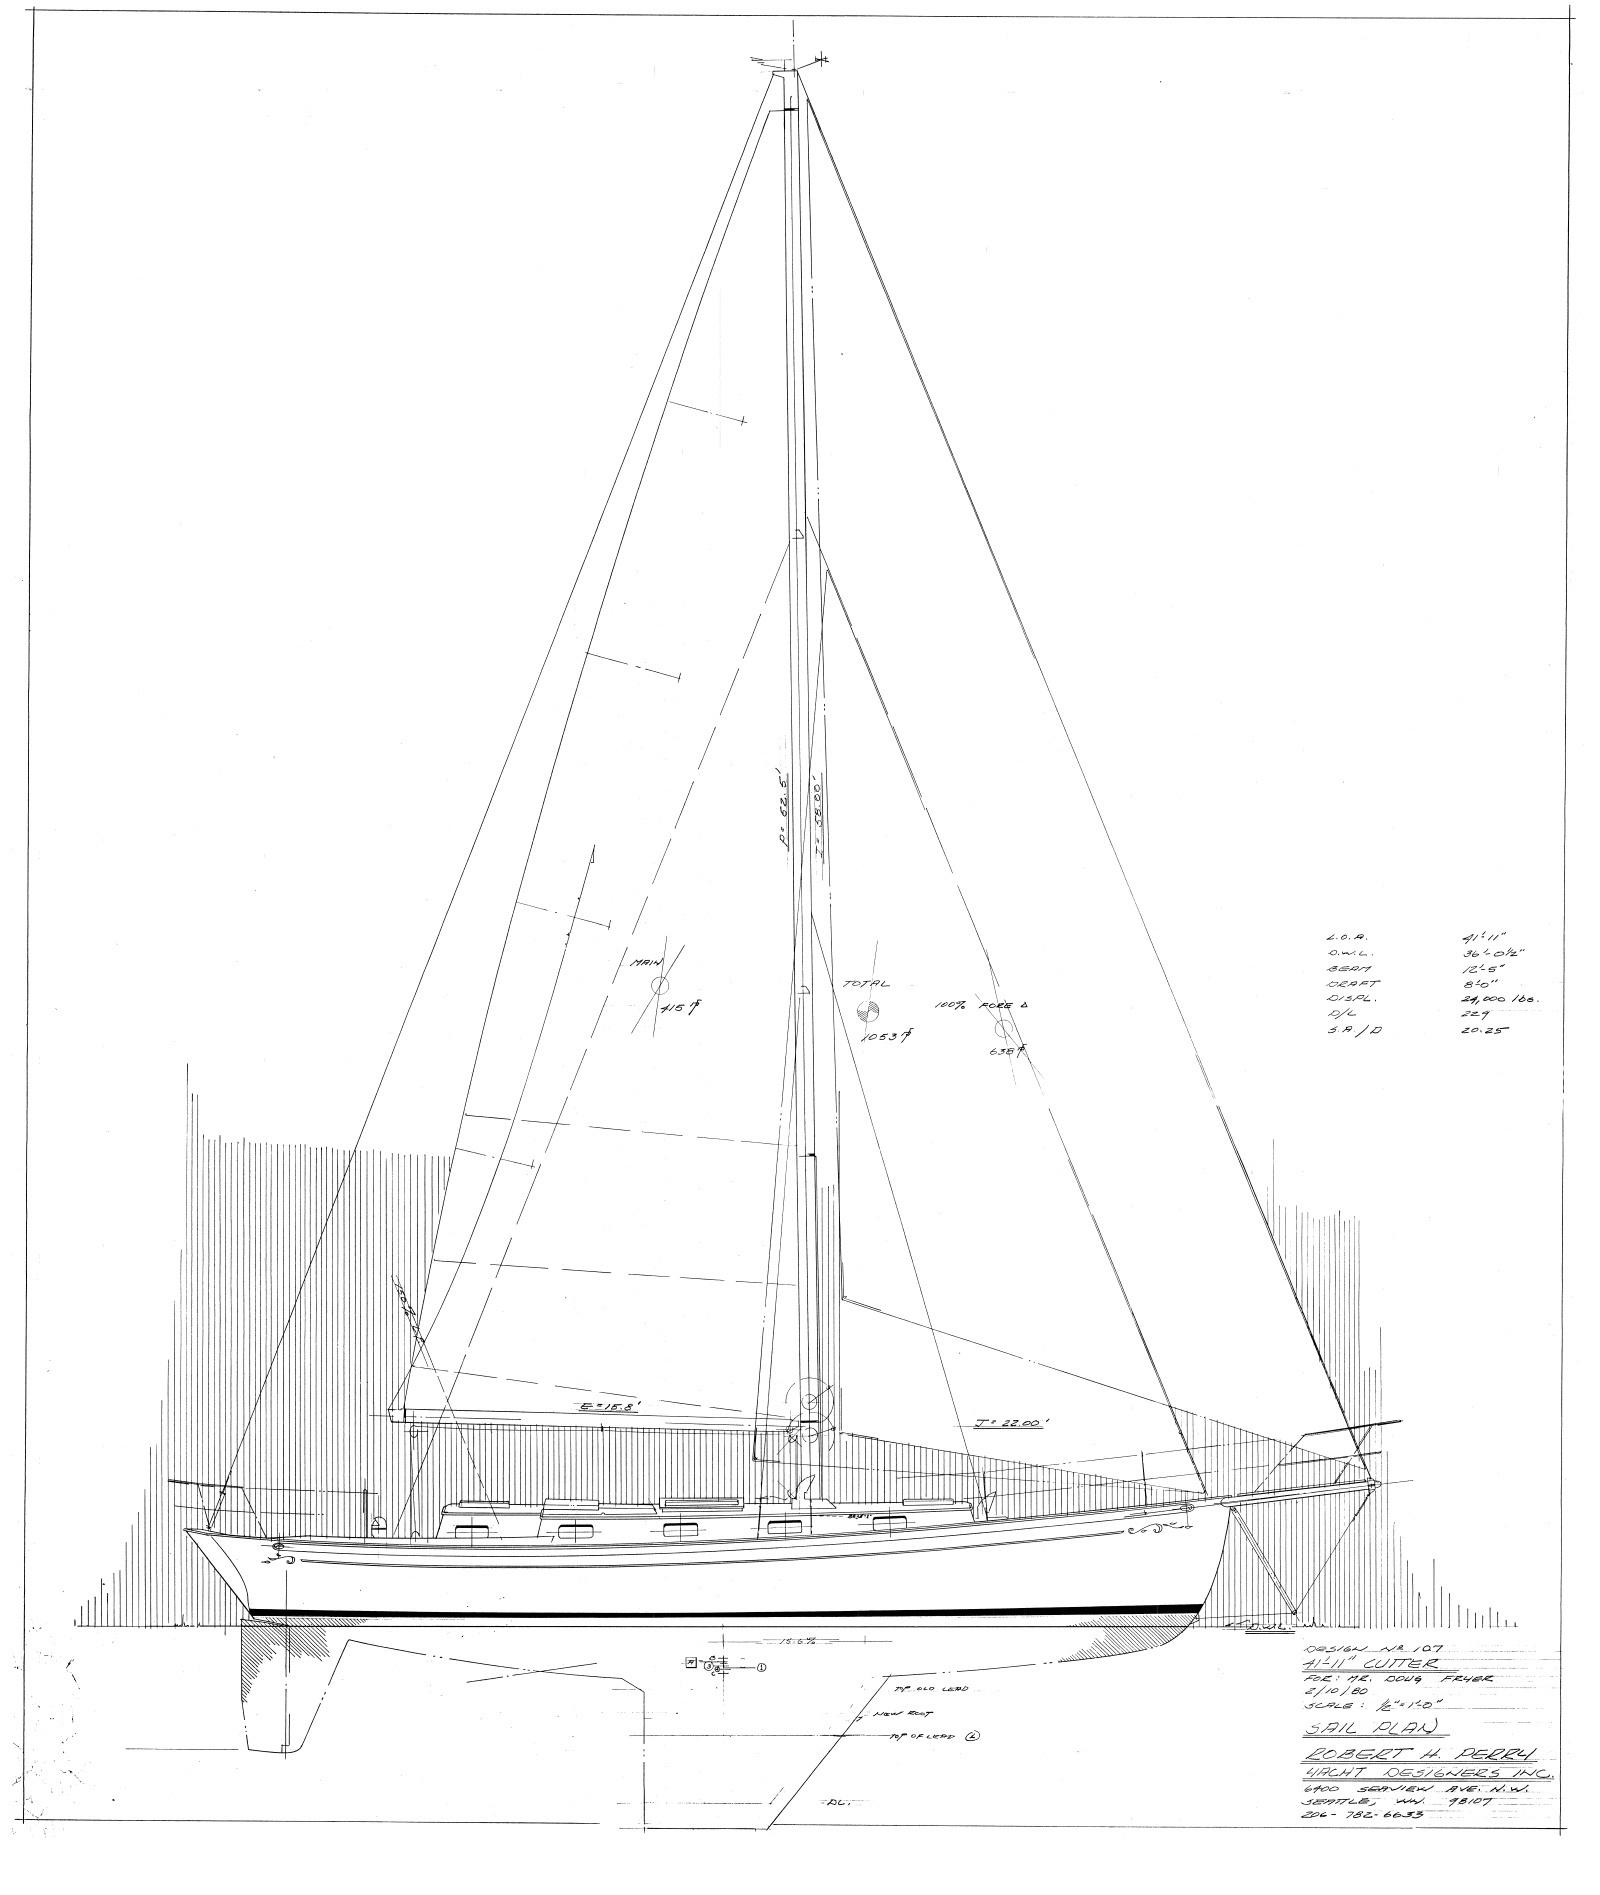 1600x1895 Yacht Design